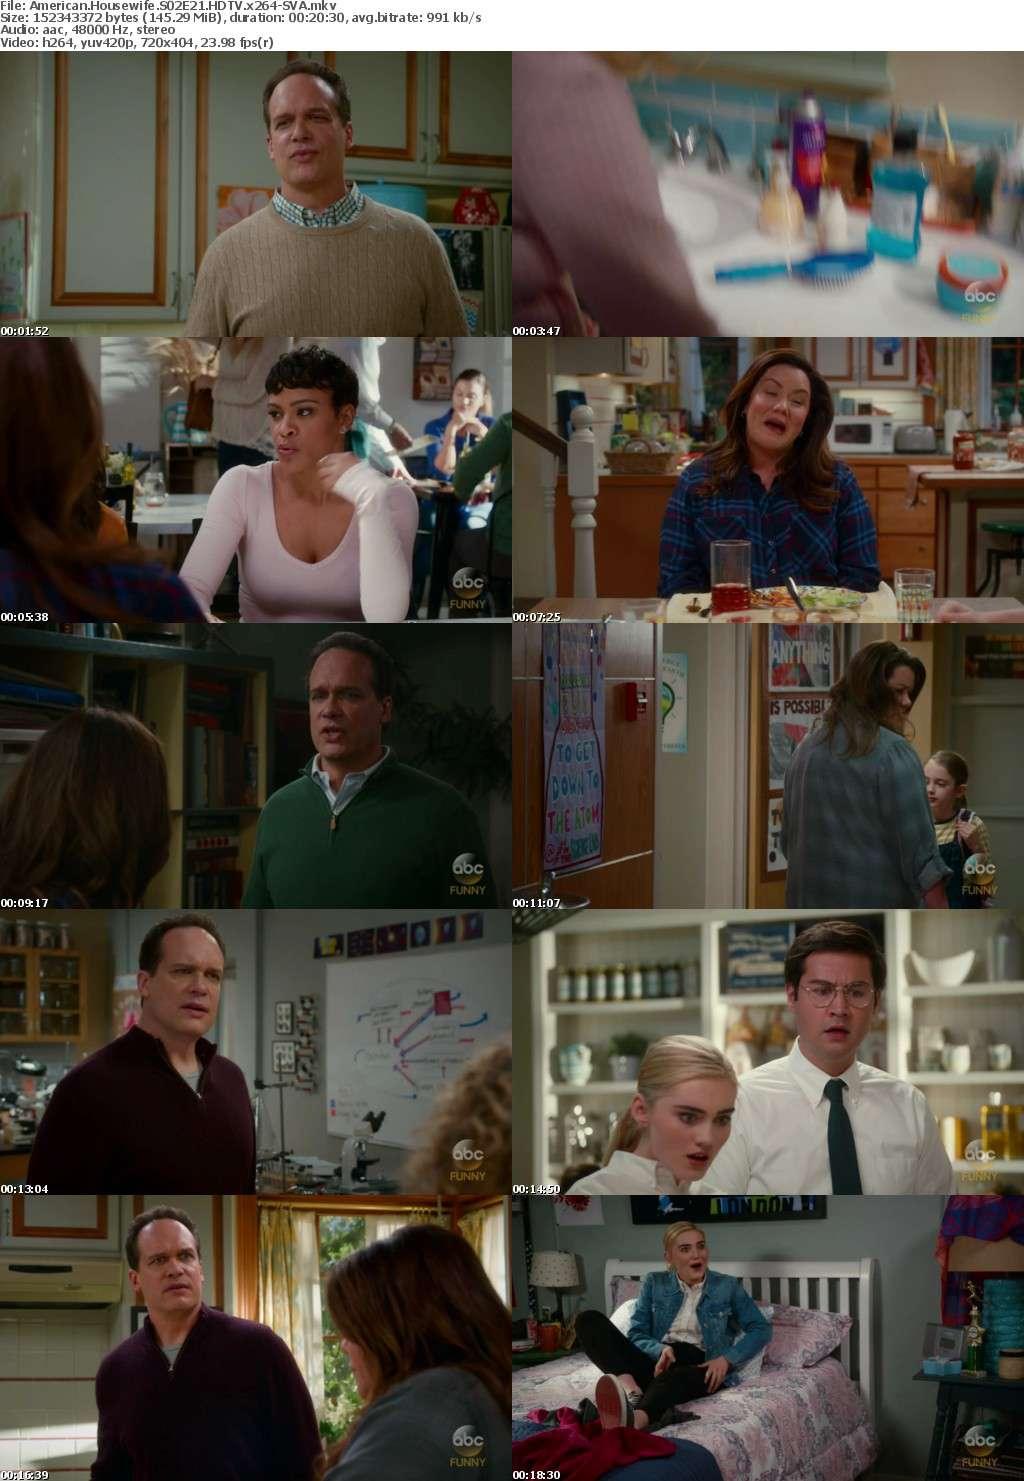 American Housewife S02E21 HDTV x264-SVA